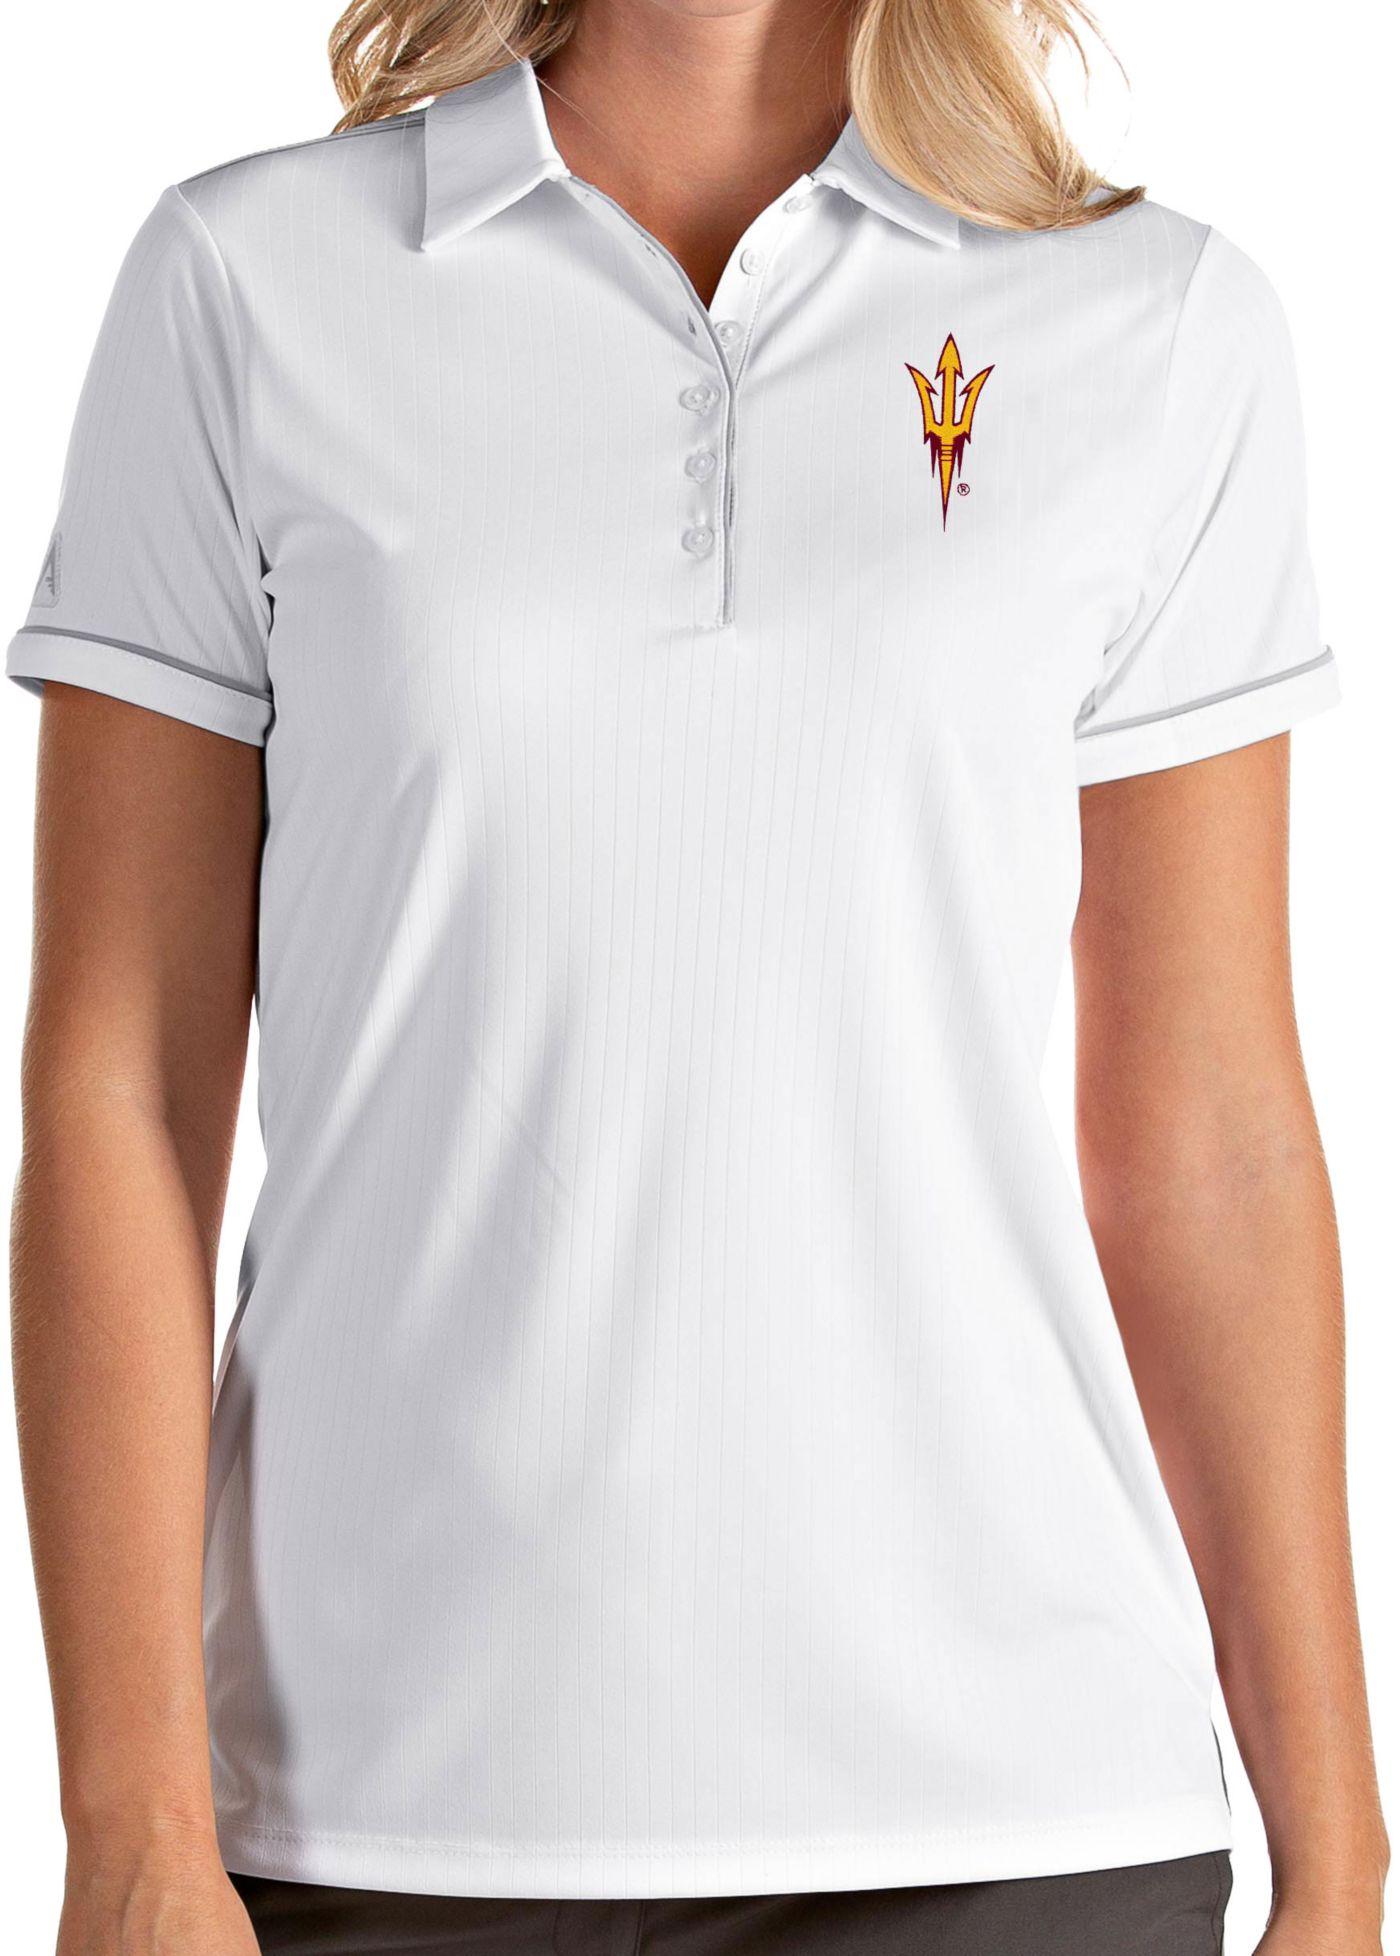 Antigua Women's Arizona State Sun Devils Salute Performance White Polo